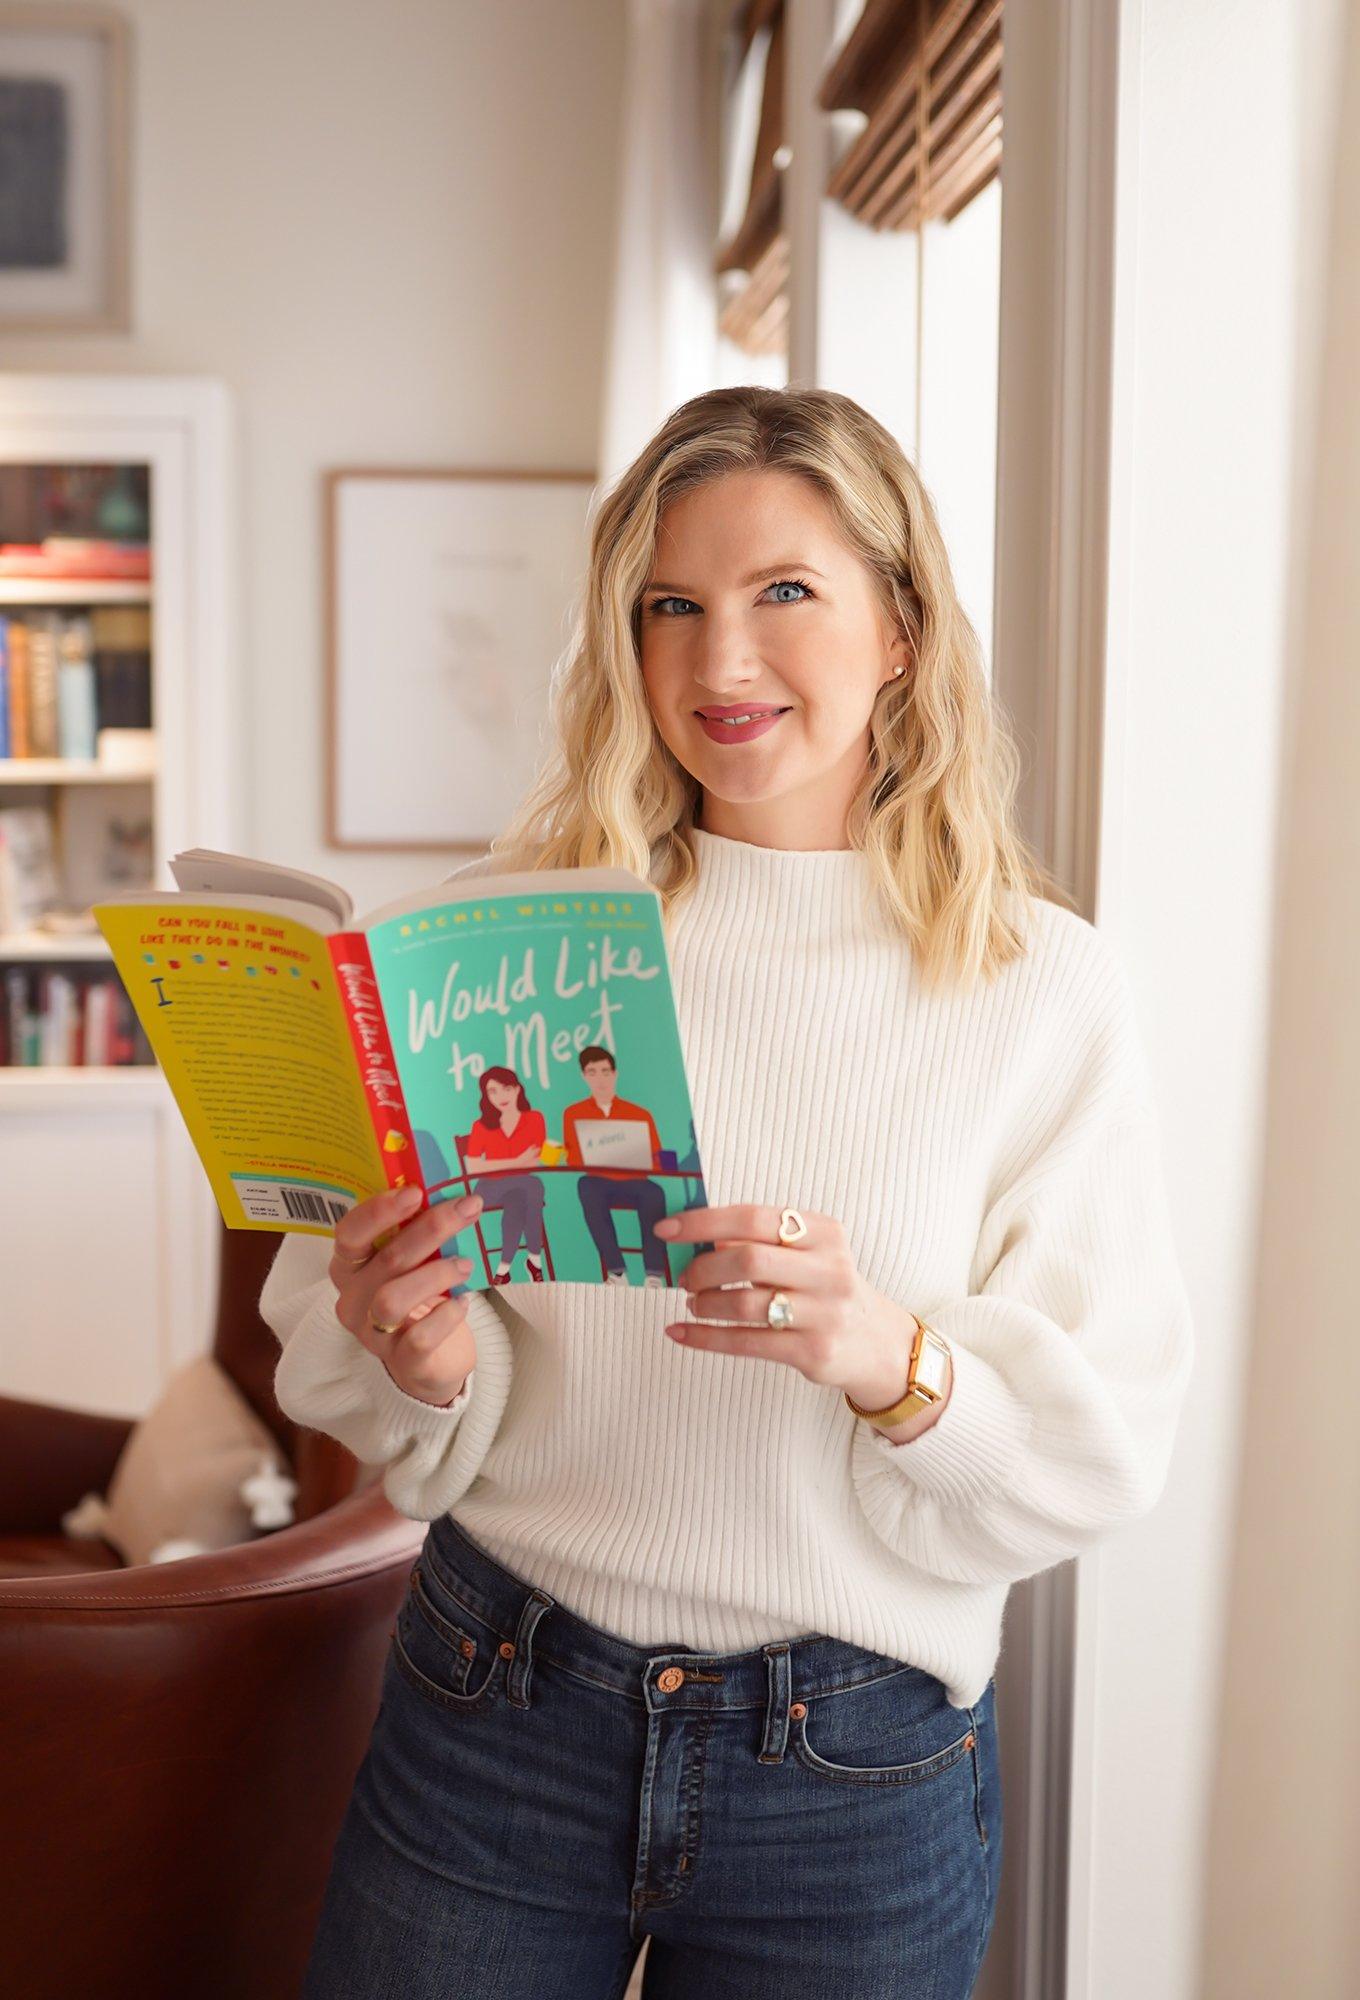 February's Book: Would Like to Meet